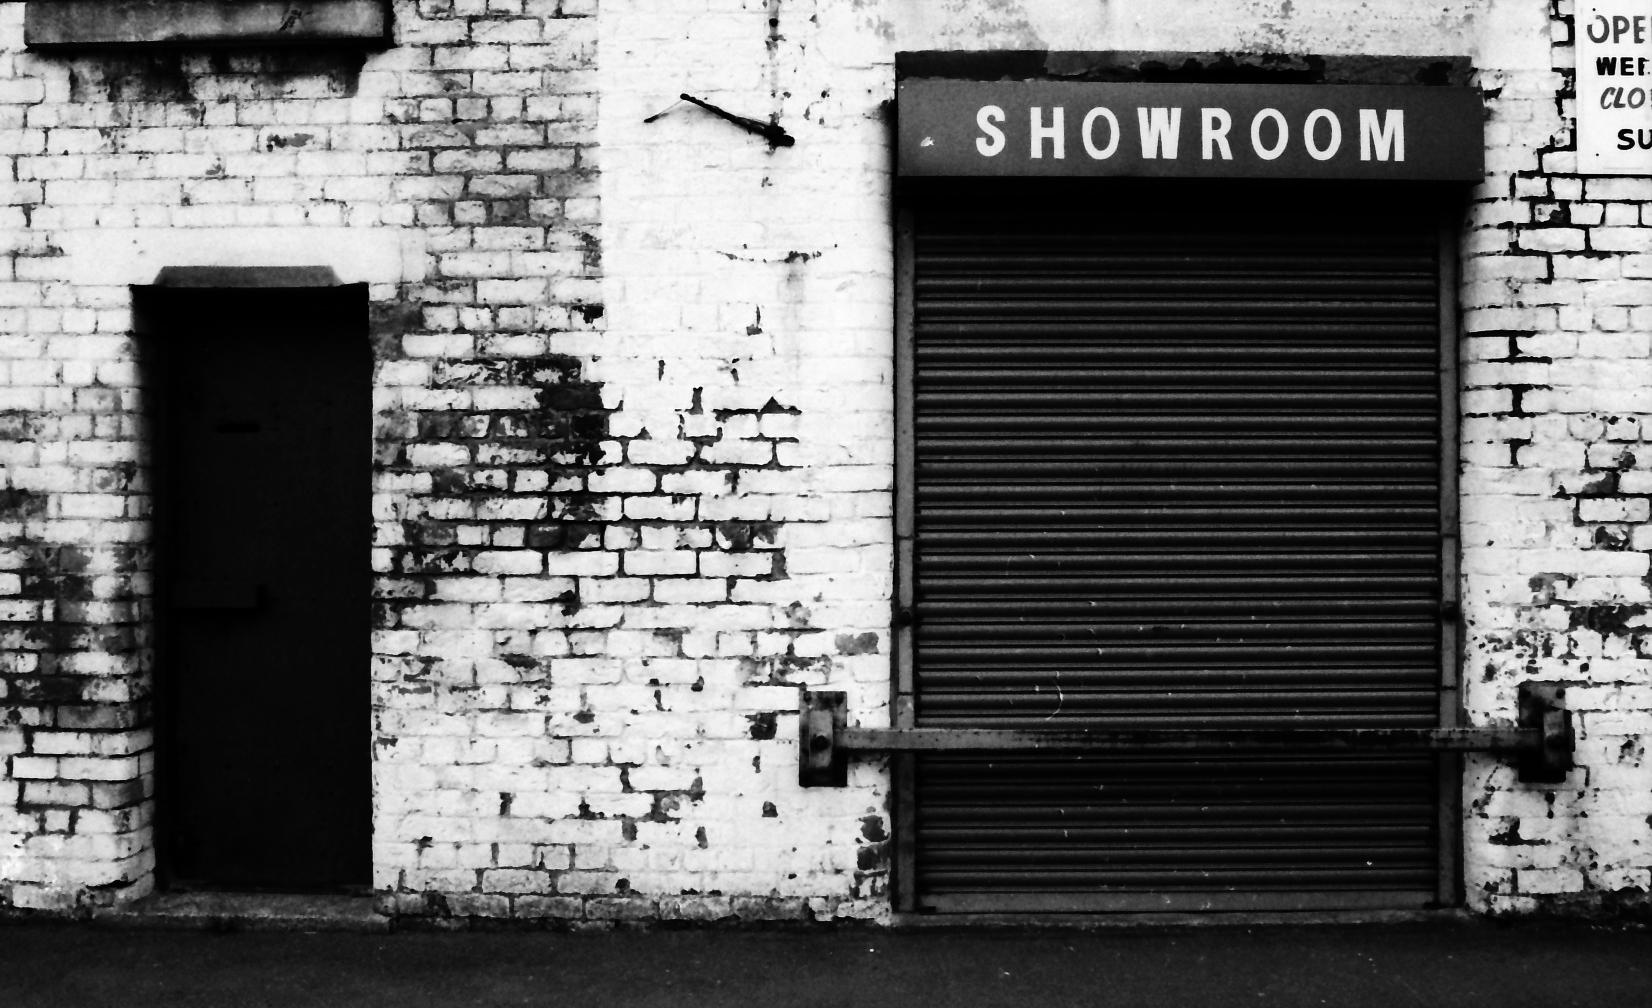 SHOWROOM, GELATIN SILVER PRINT, 2010